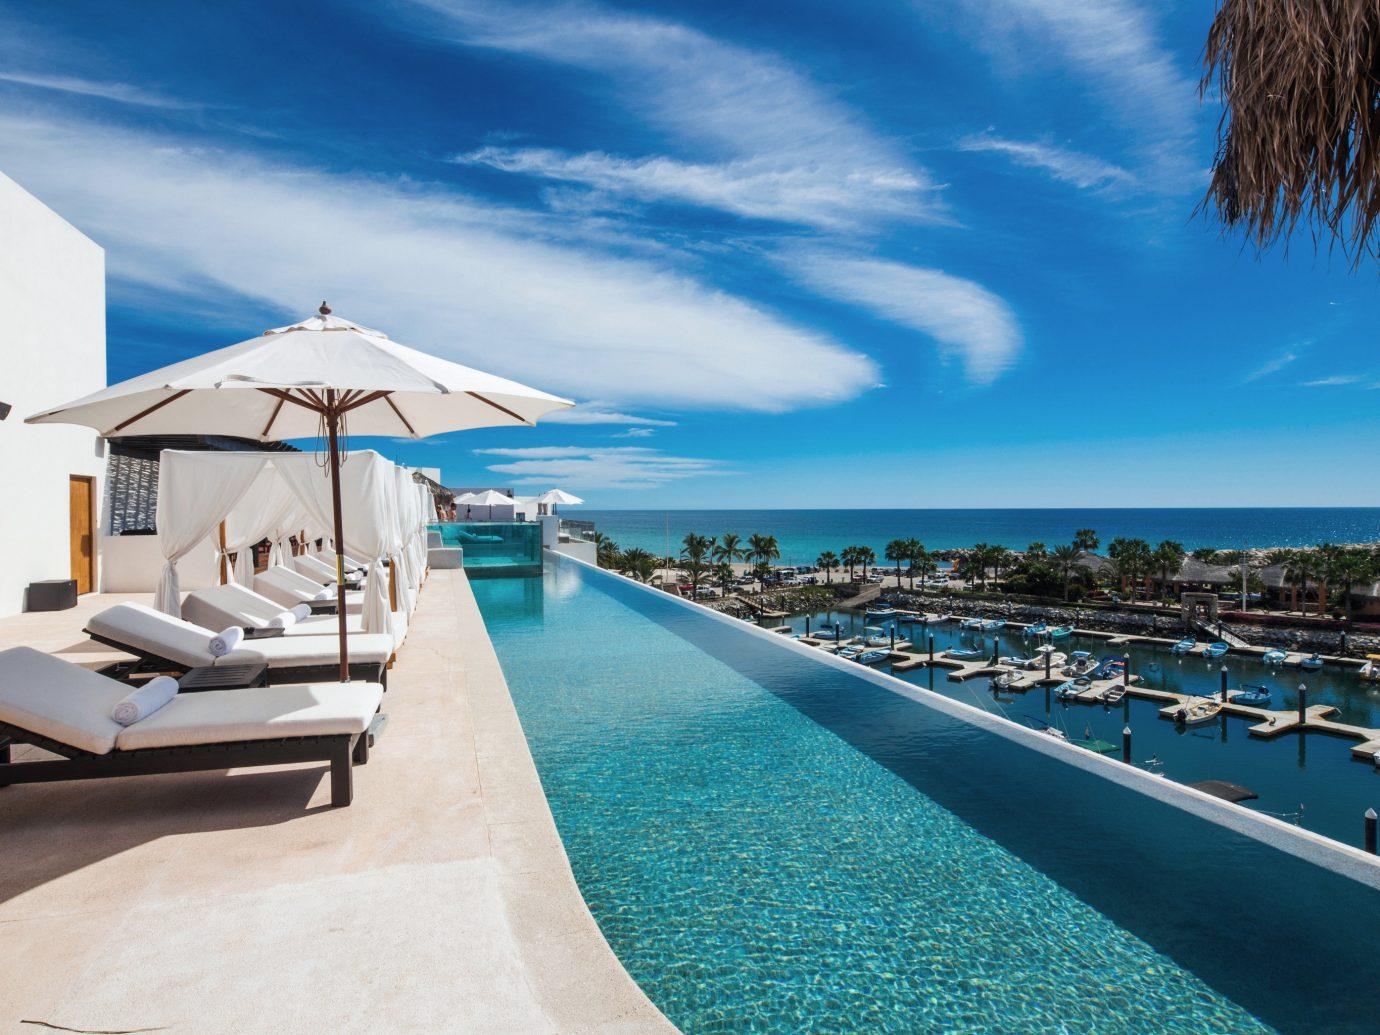 Budget Hotels Luxury Pool Scenic views Waterfront sky outdoor Sea chair Beach vacation Ocean caribbean swimming pool Resort marina estate Coast bay dock Lagoon blue lined shore sandy several